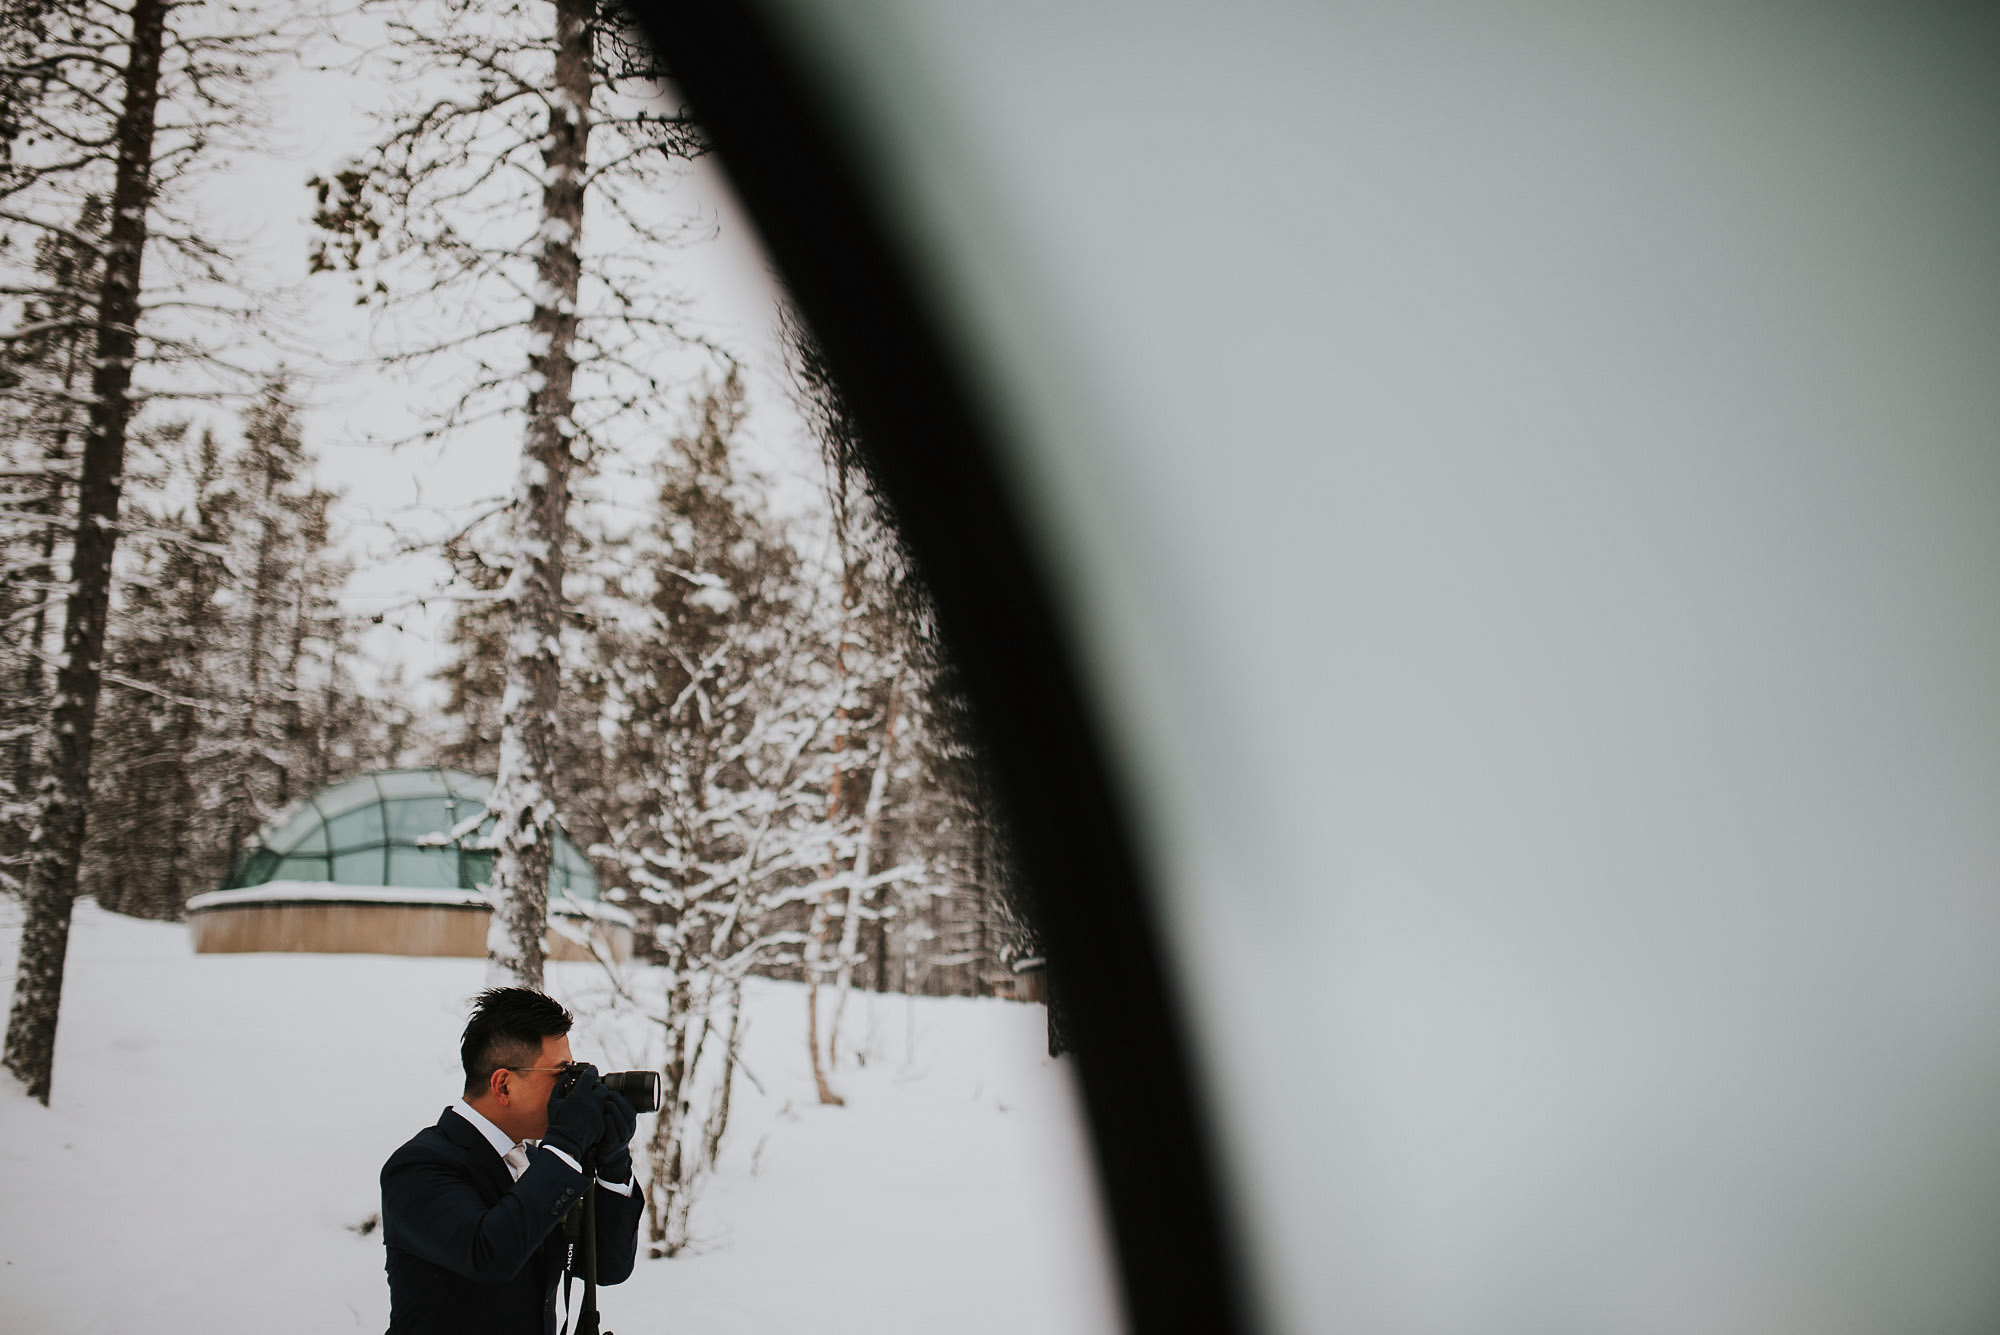 levi-ice-chapel-weddings-lapland-finland-photographer-jere-satamo-007-blog.jpg